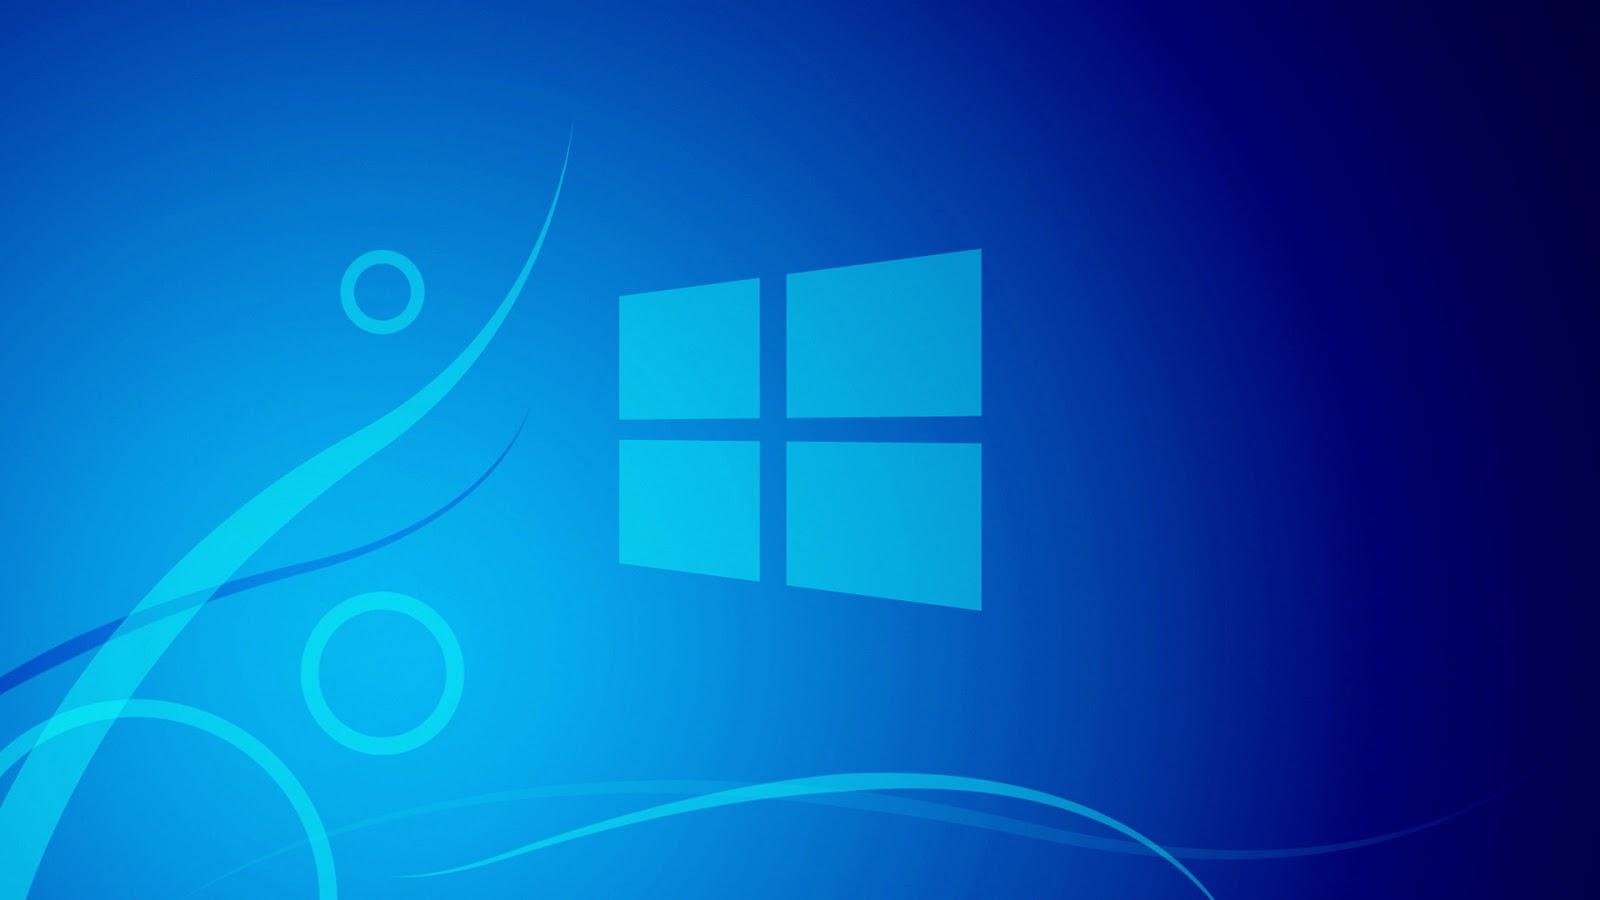 48 Windows 8 Hd Wallpapers 1080p On Wallpapersafari